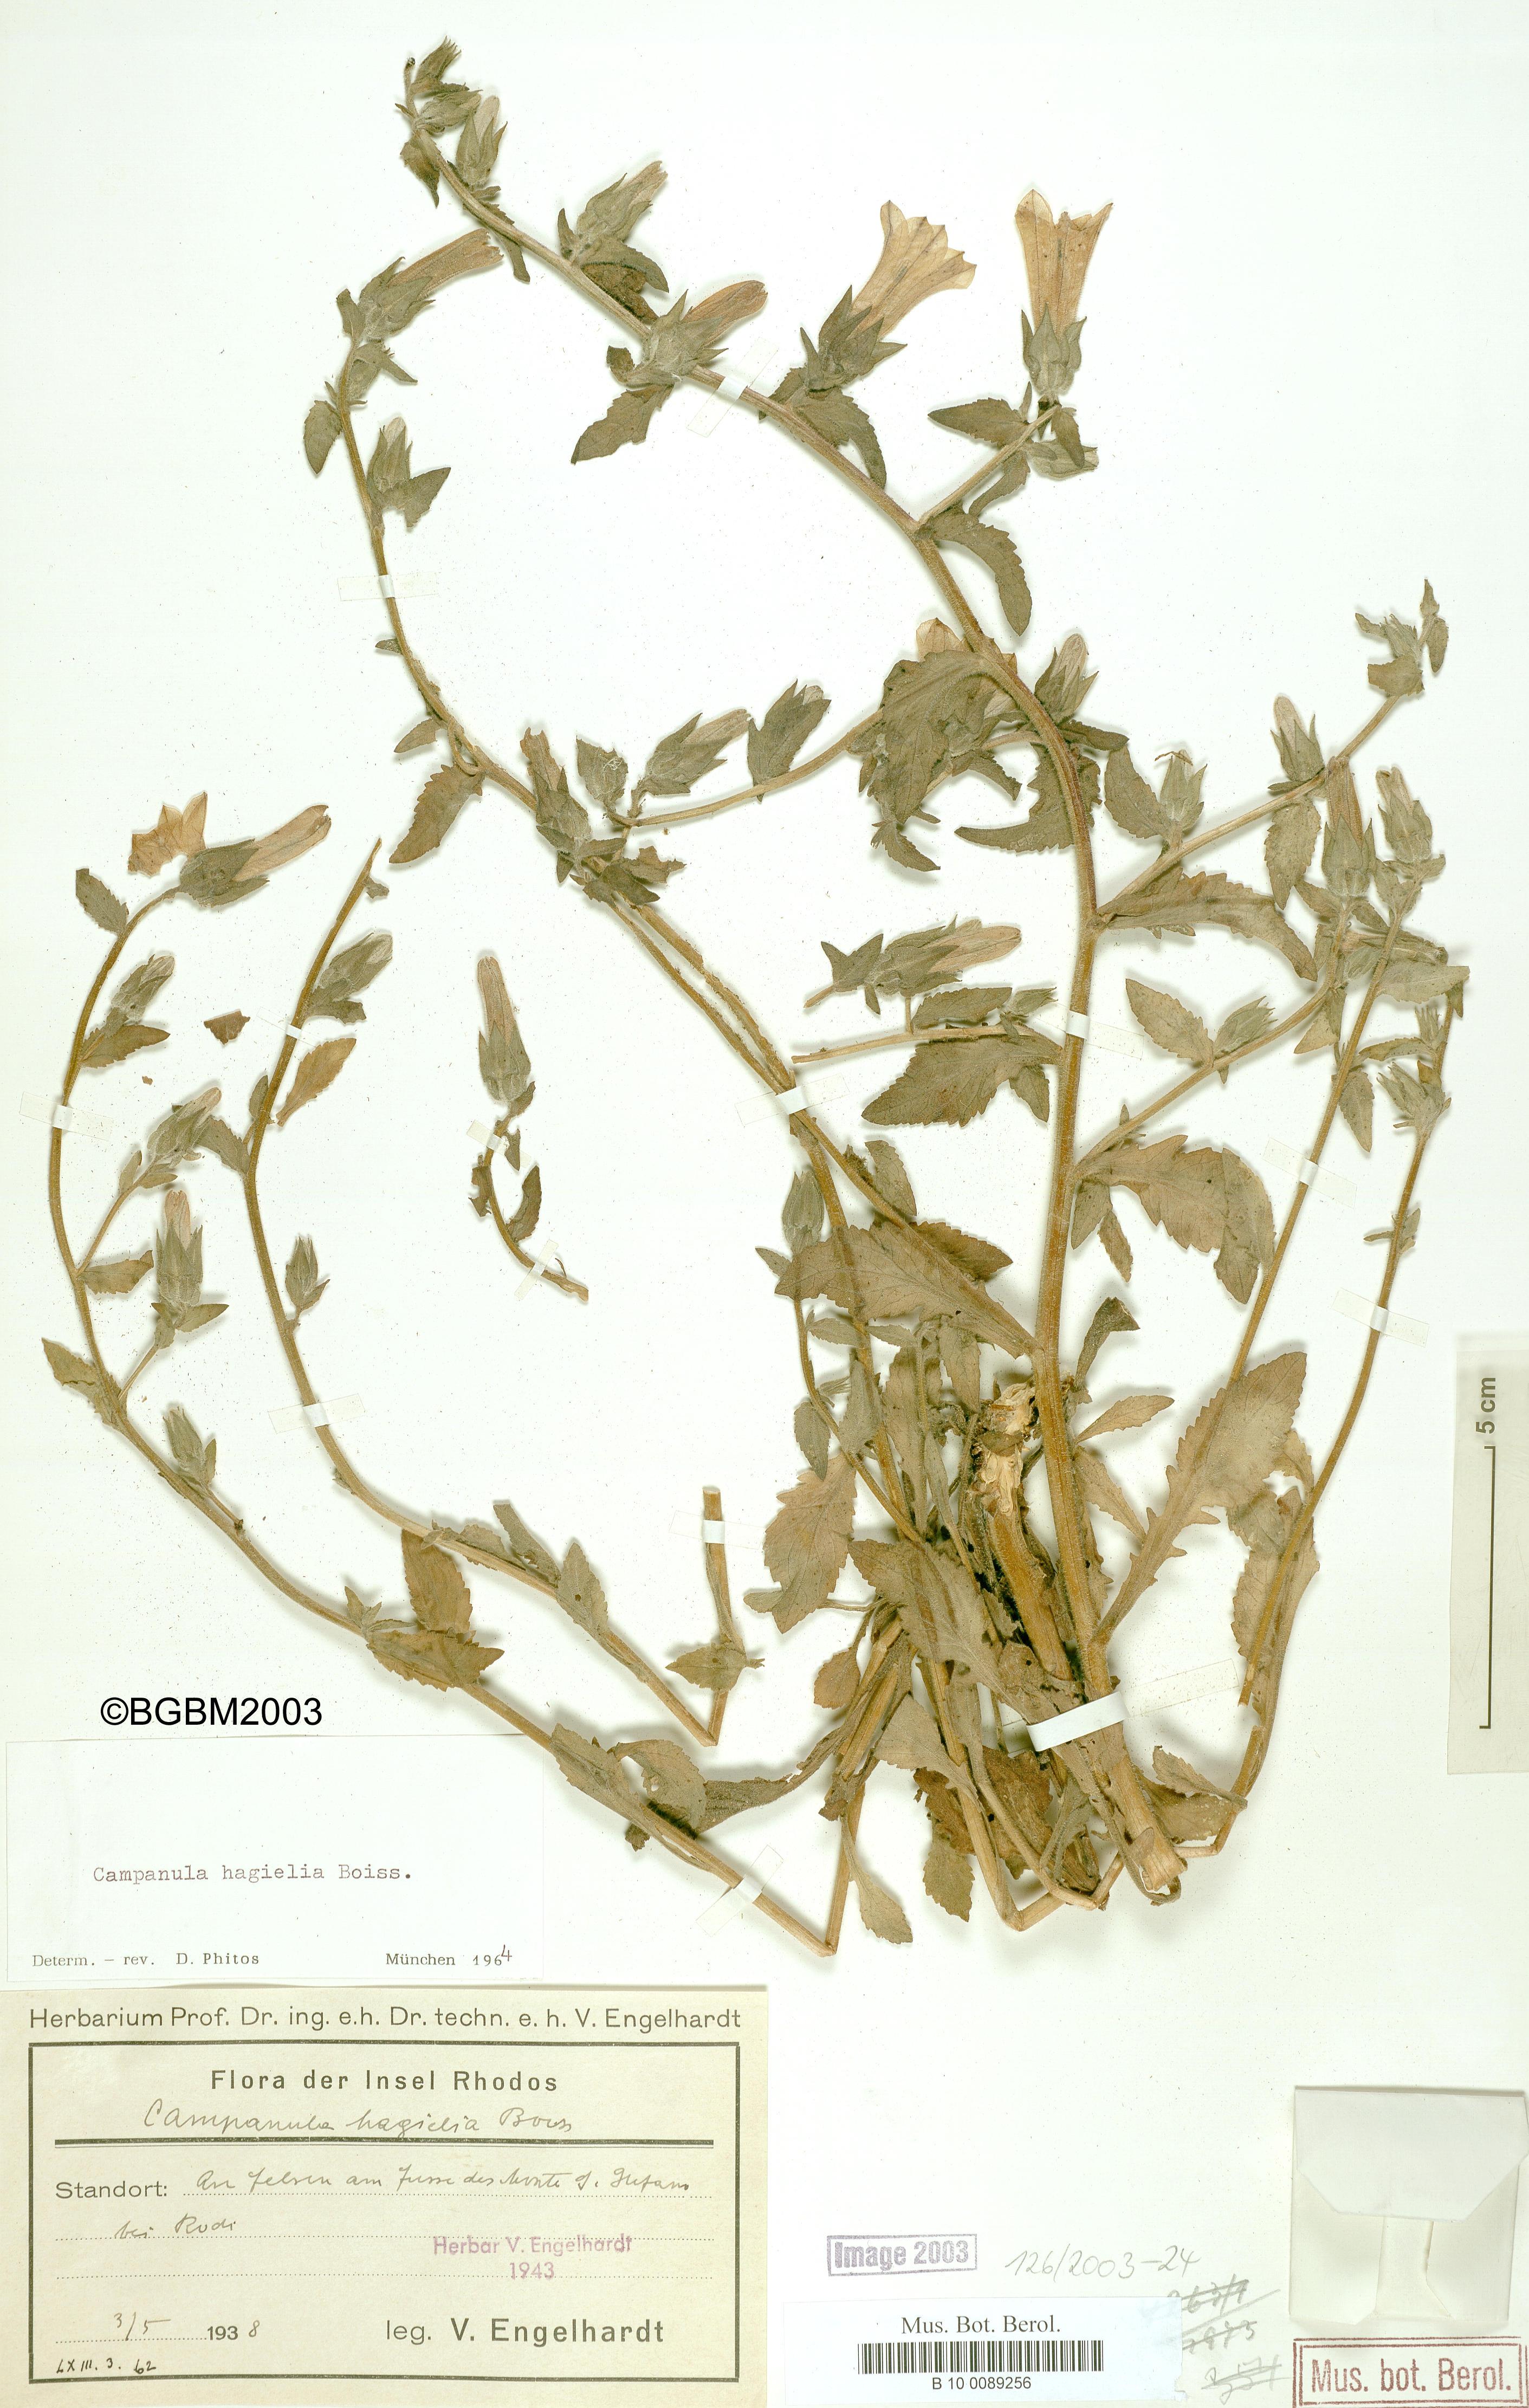 http://ww2.bgbm.org/herbarium/images/B/10/00/89/25/B_10_0089256.jpg